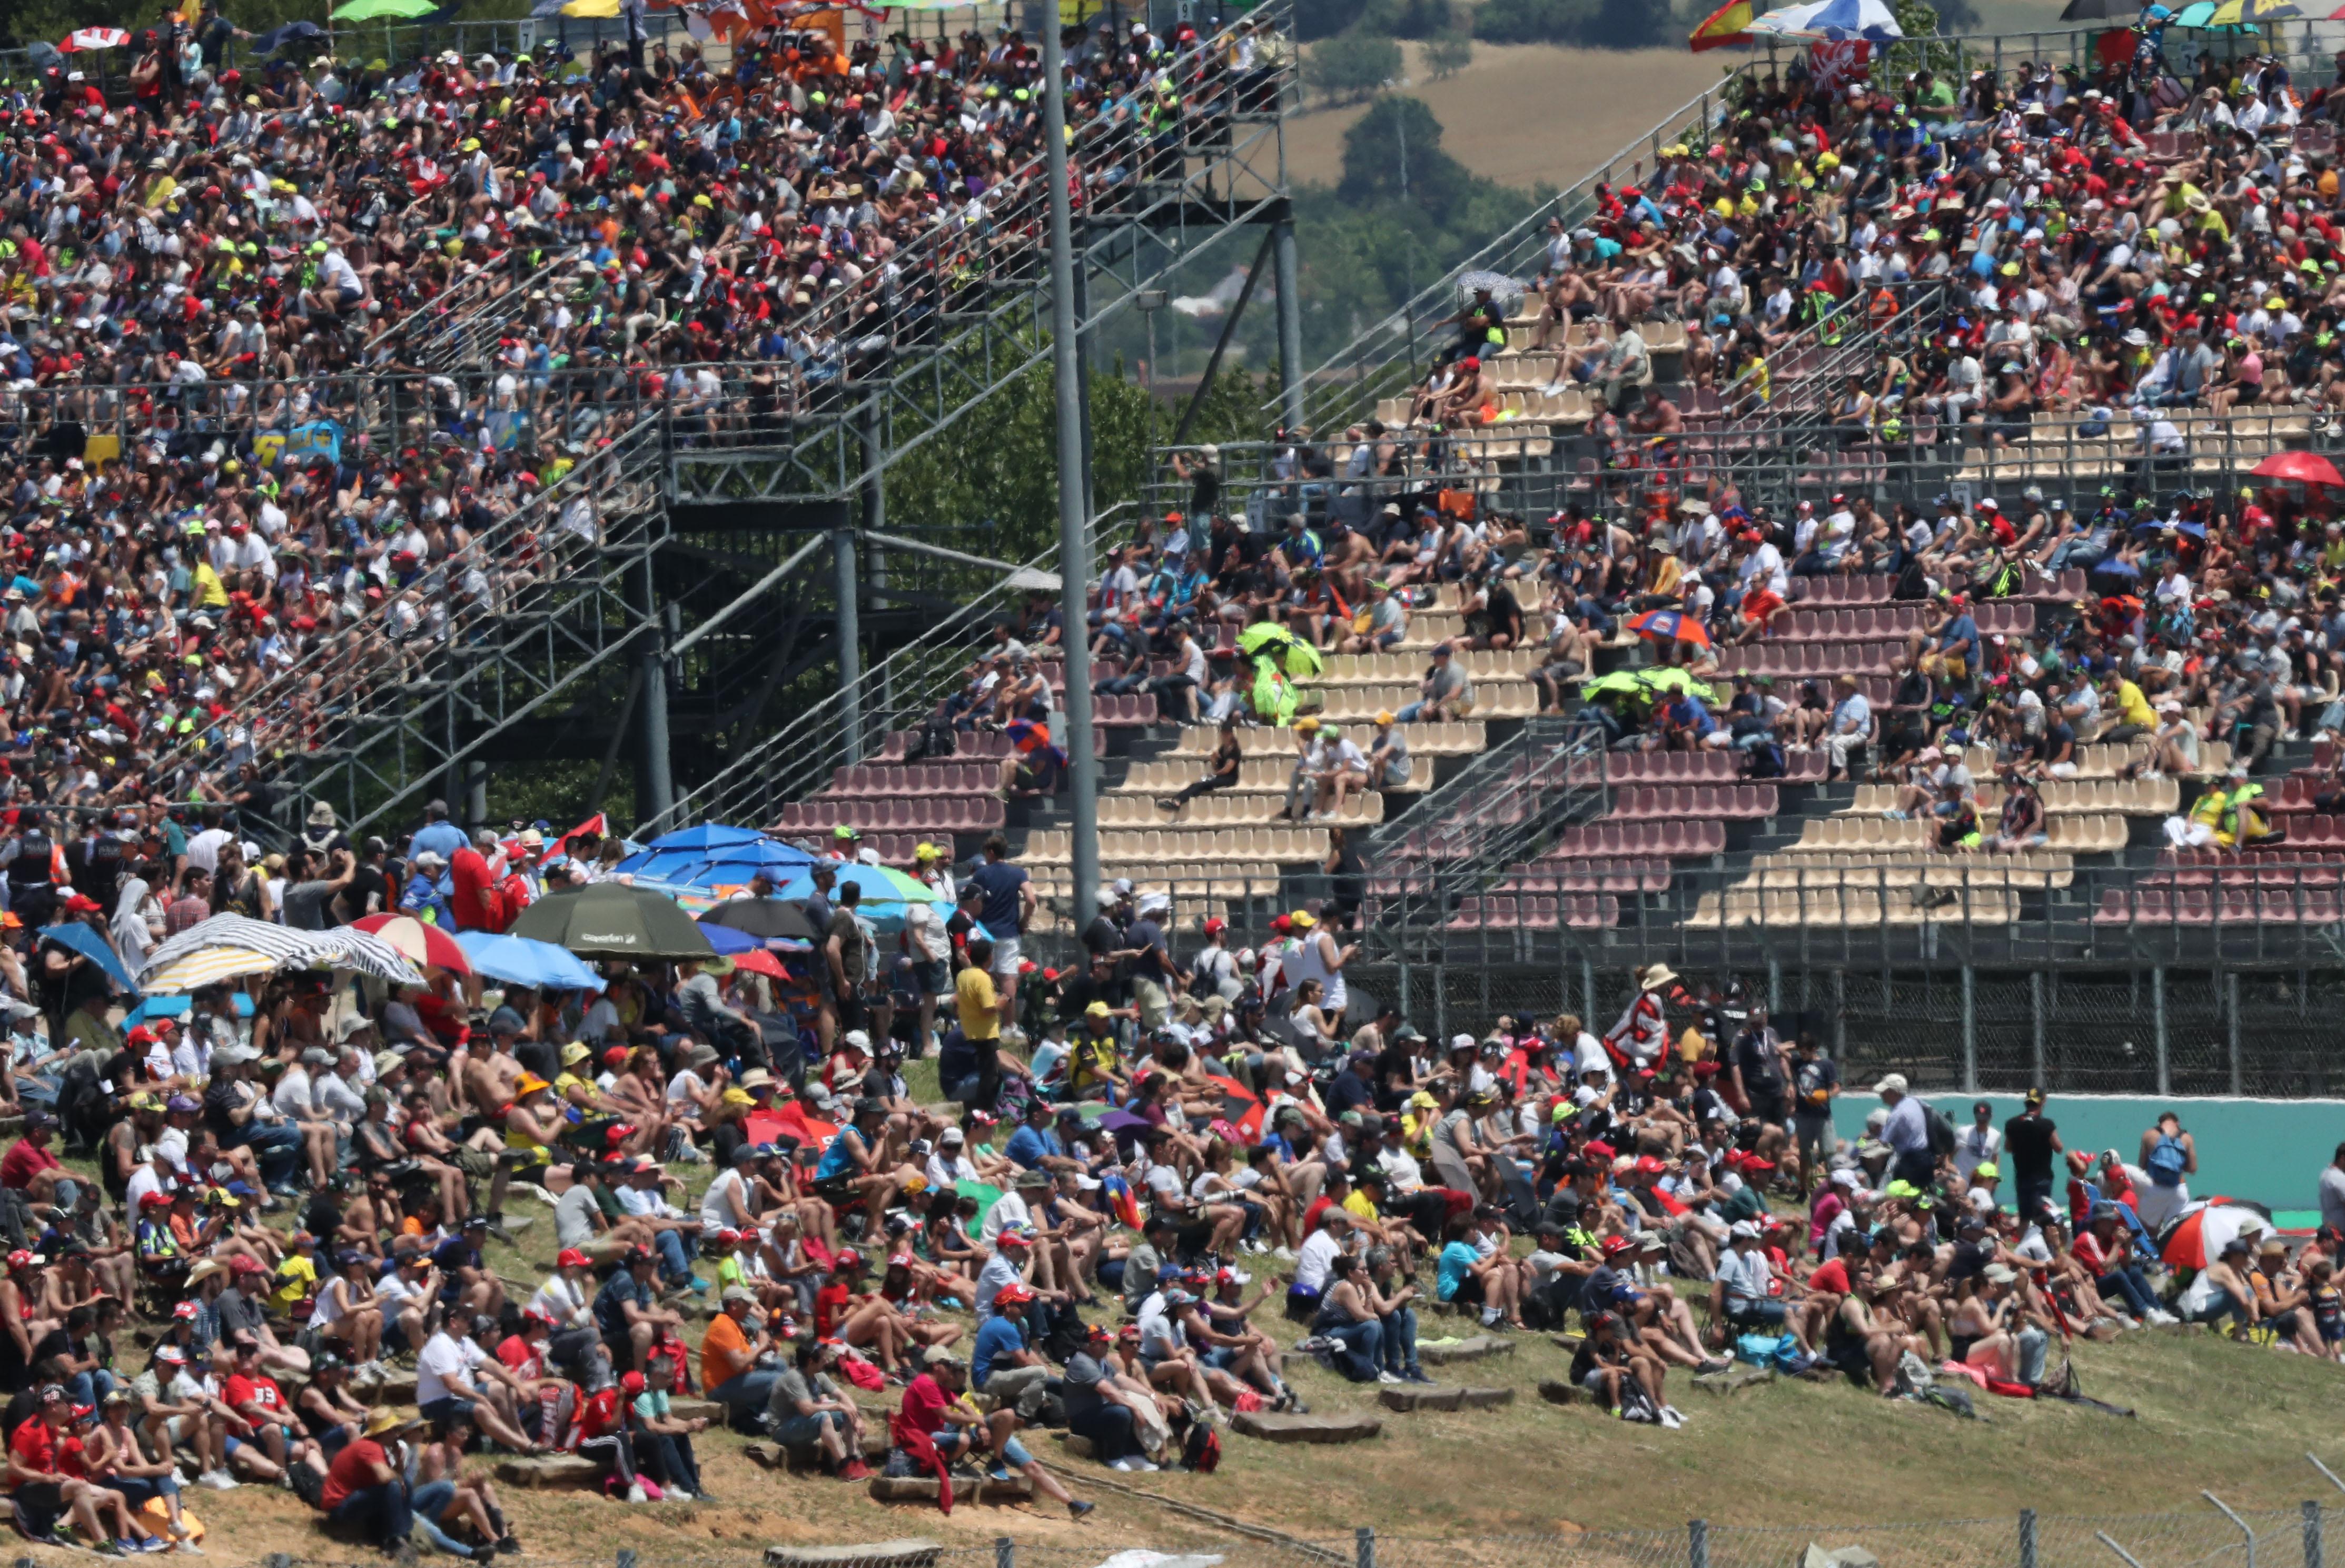 MotoGP Barcelona crowds 2019